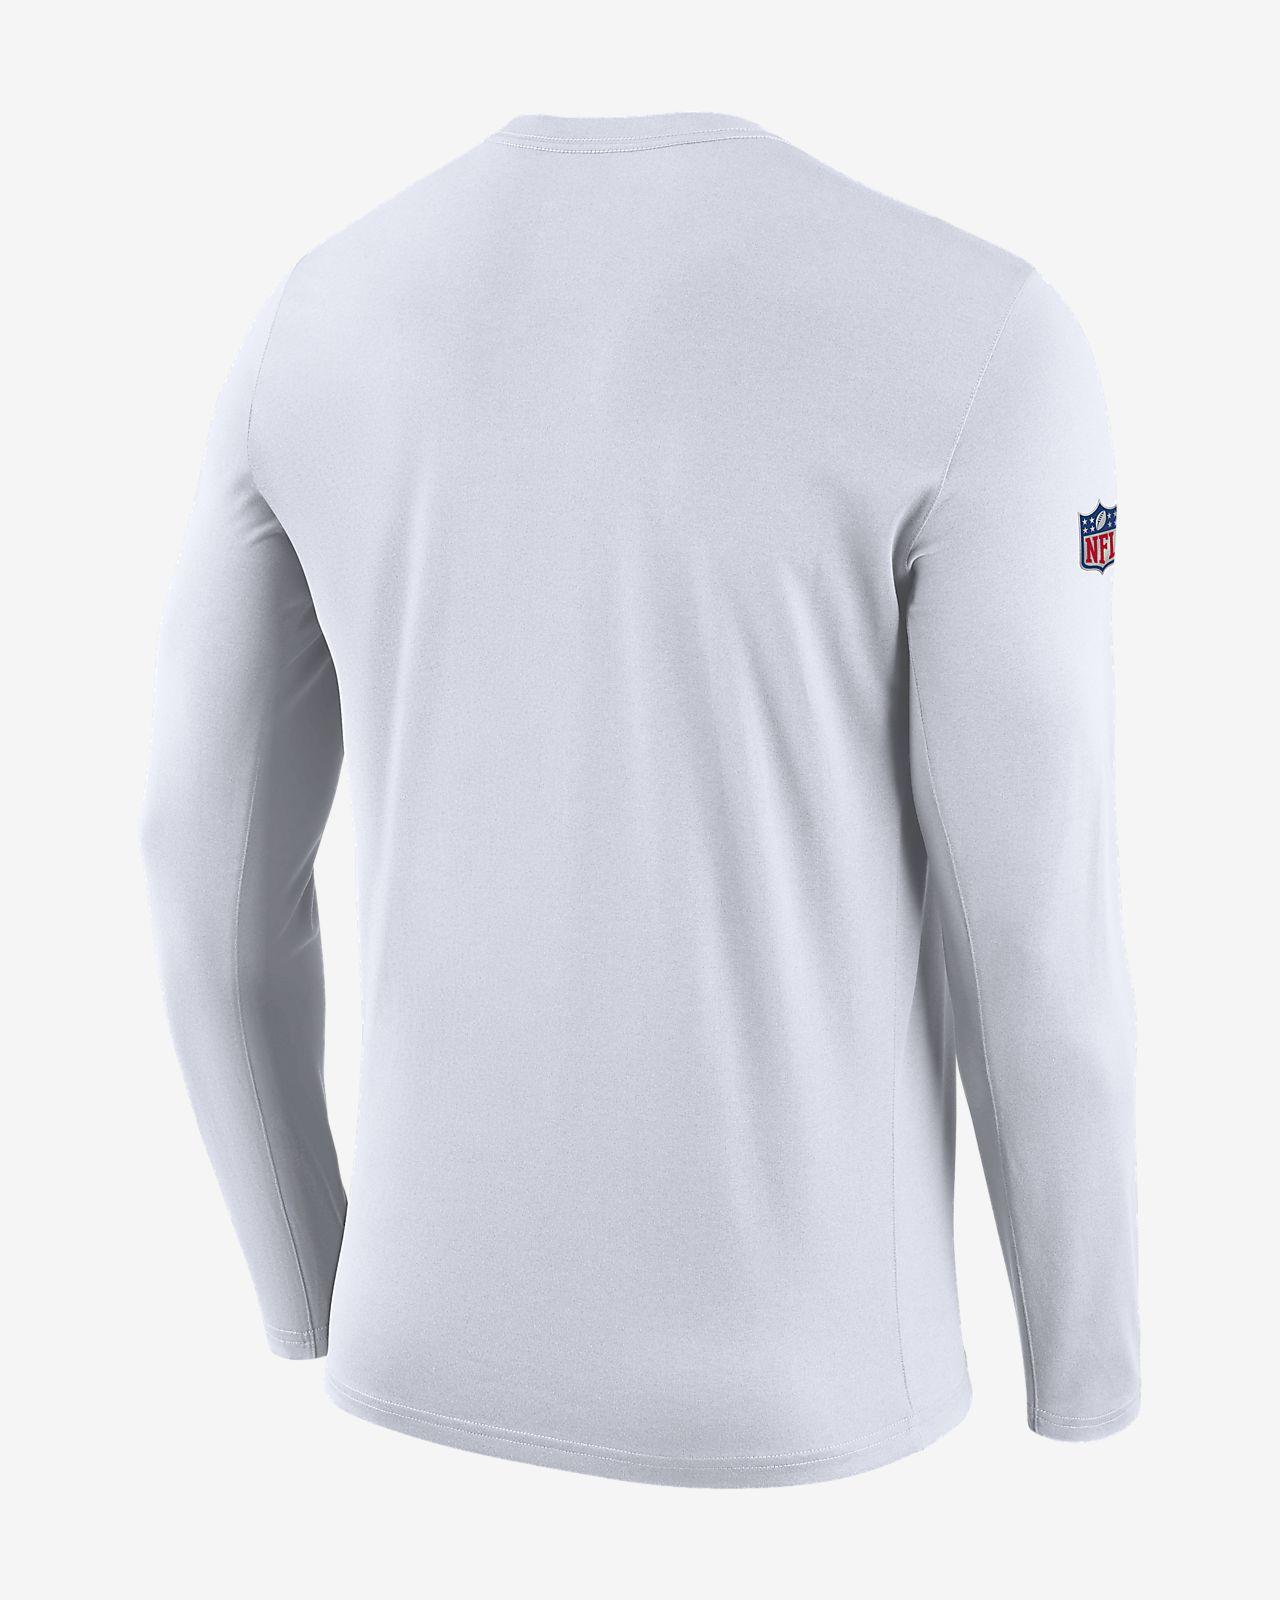 3fd8d7c0 Nike Legend (NFL Steelers) Men's Long-Sleeve T-Shirt